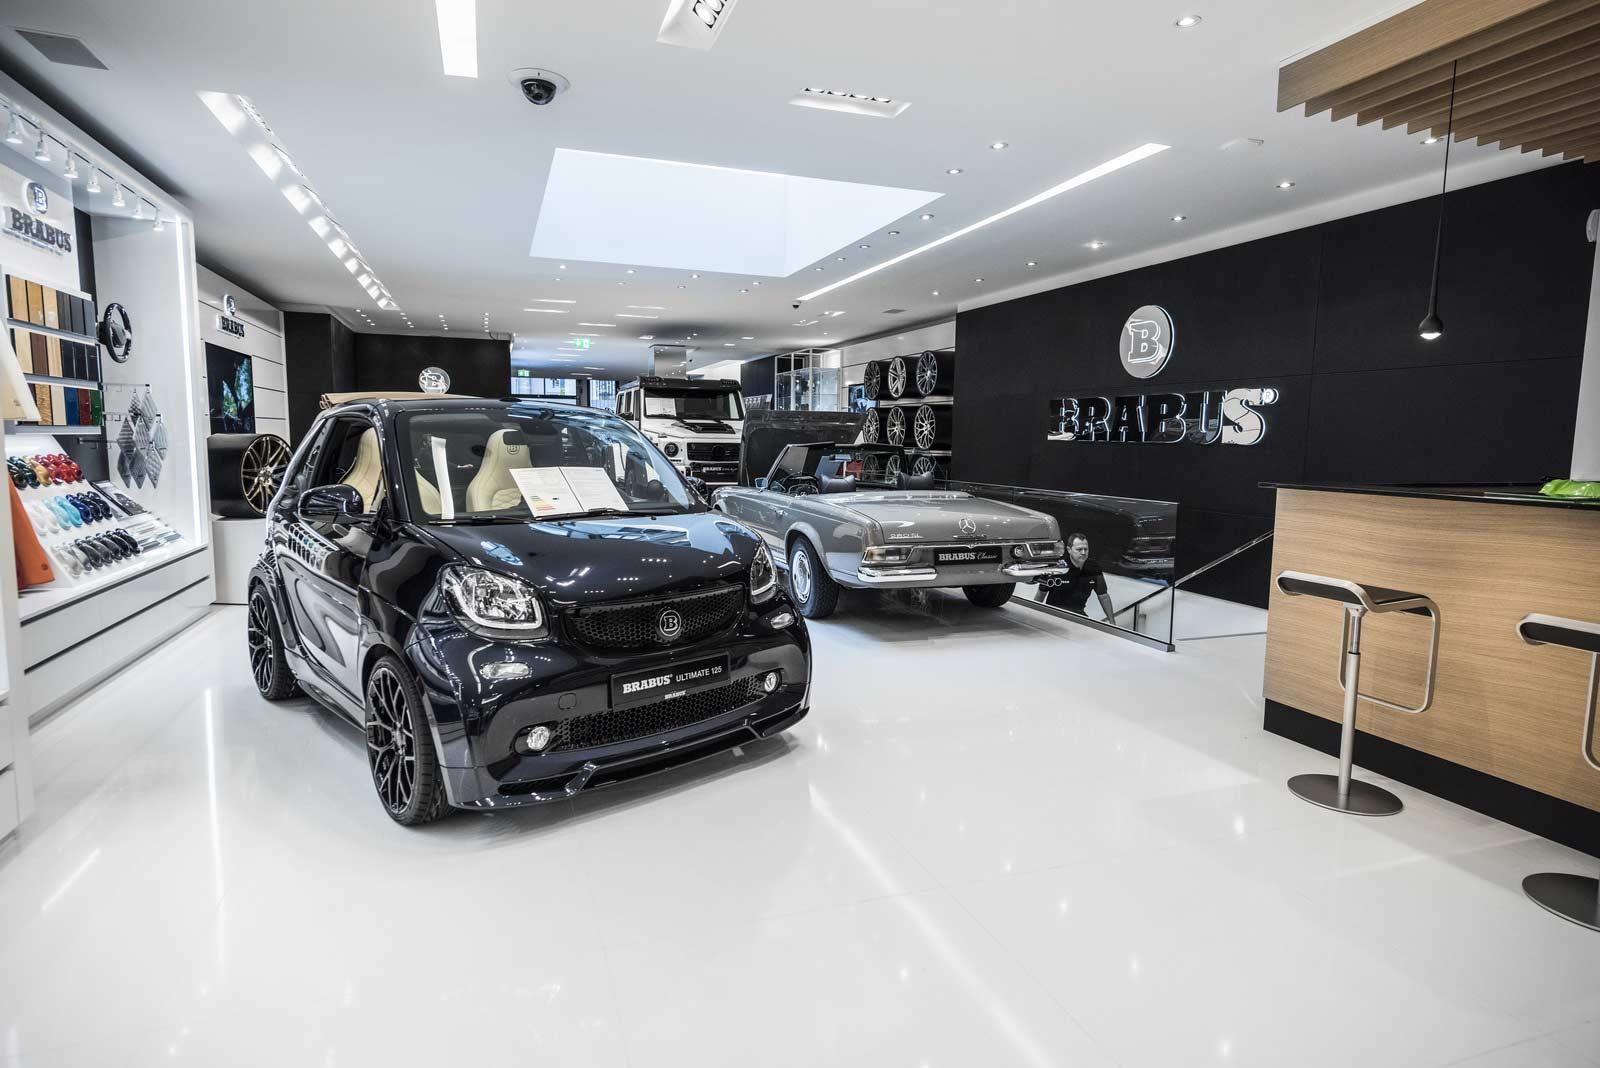 Brabus-Sunseeker-flagship-store-Dusseldorf_8